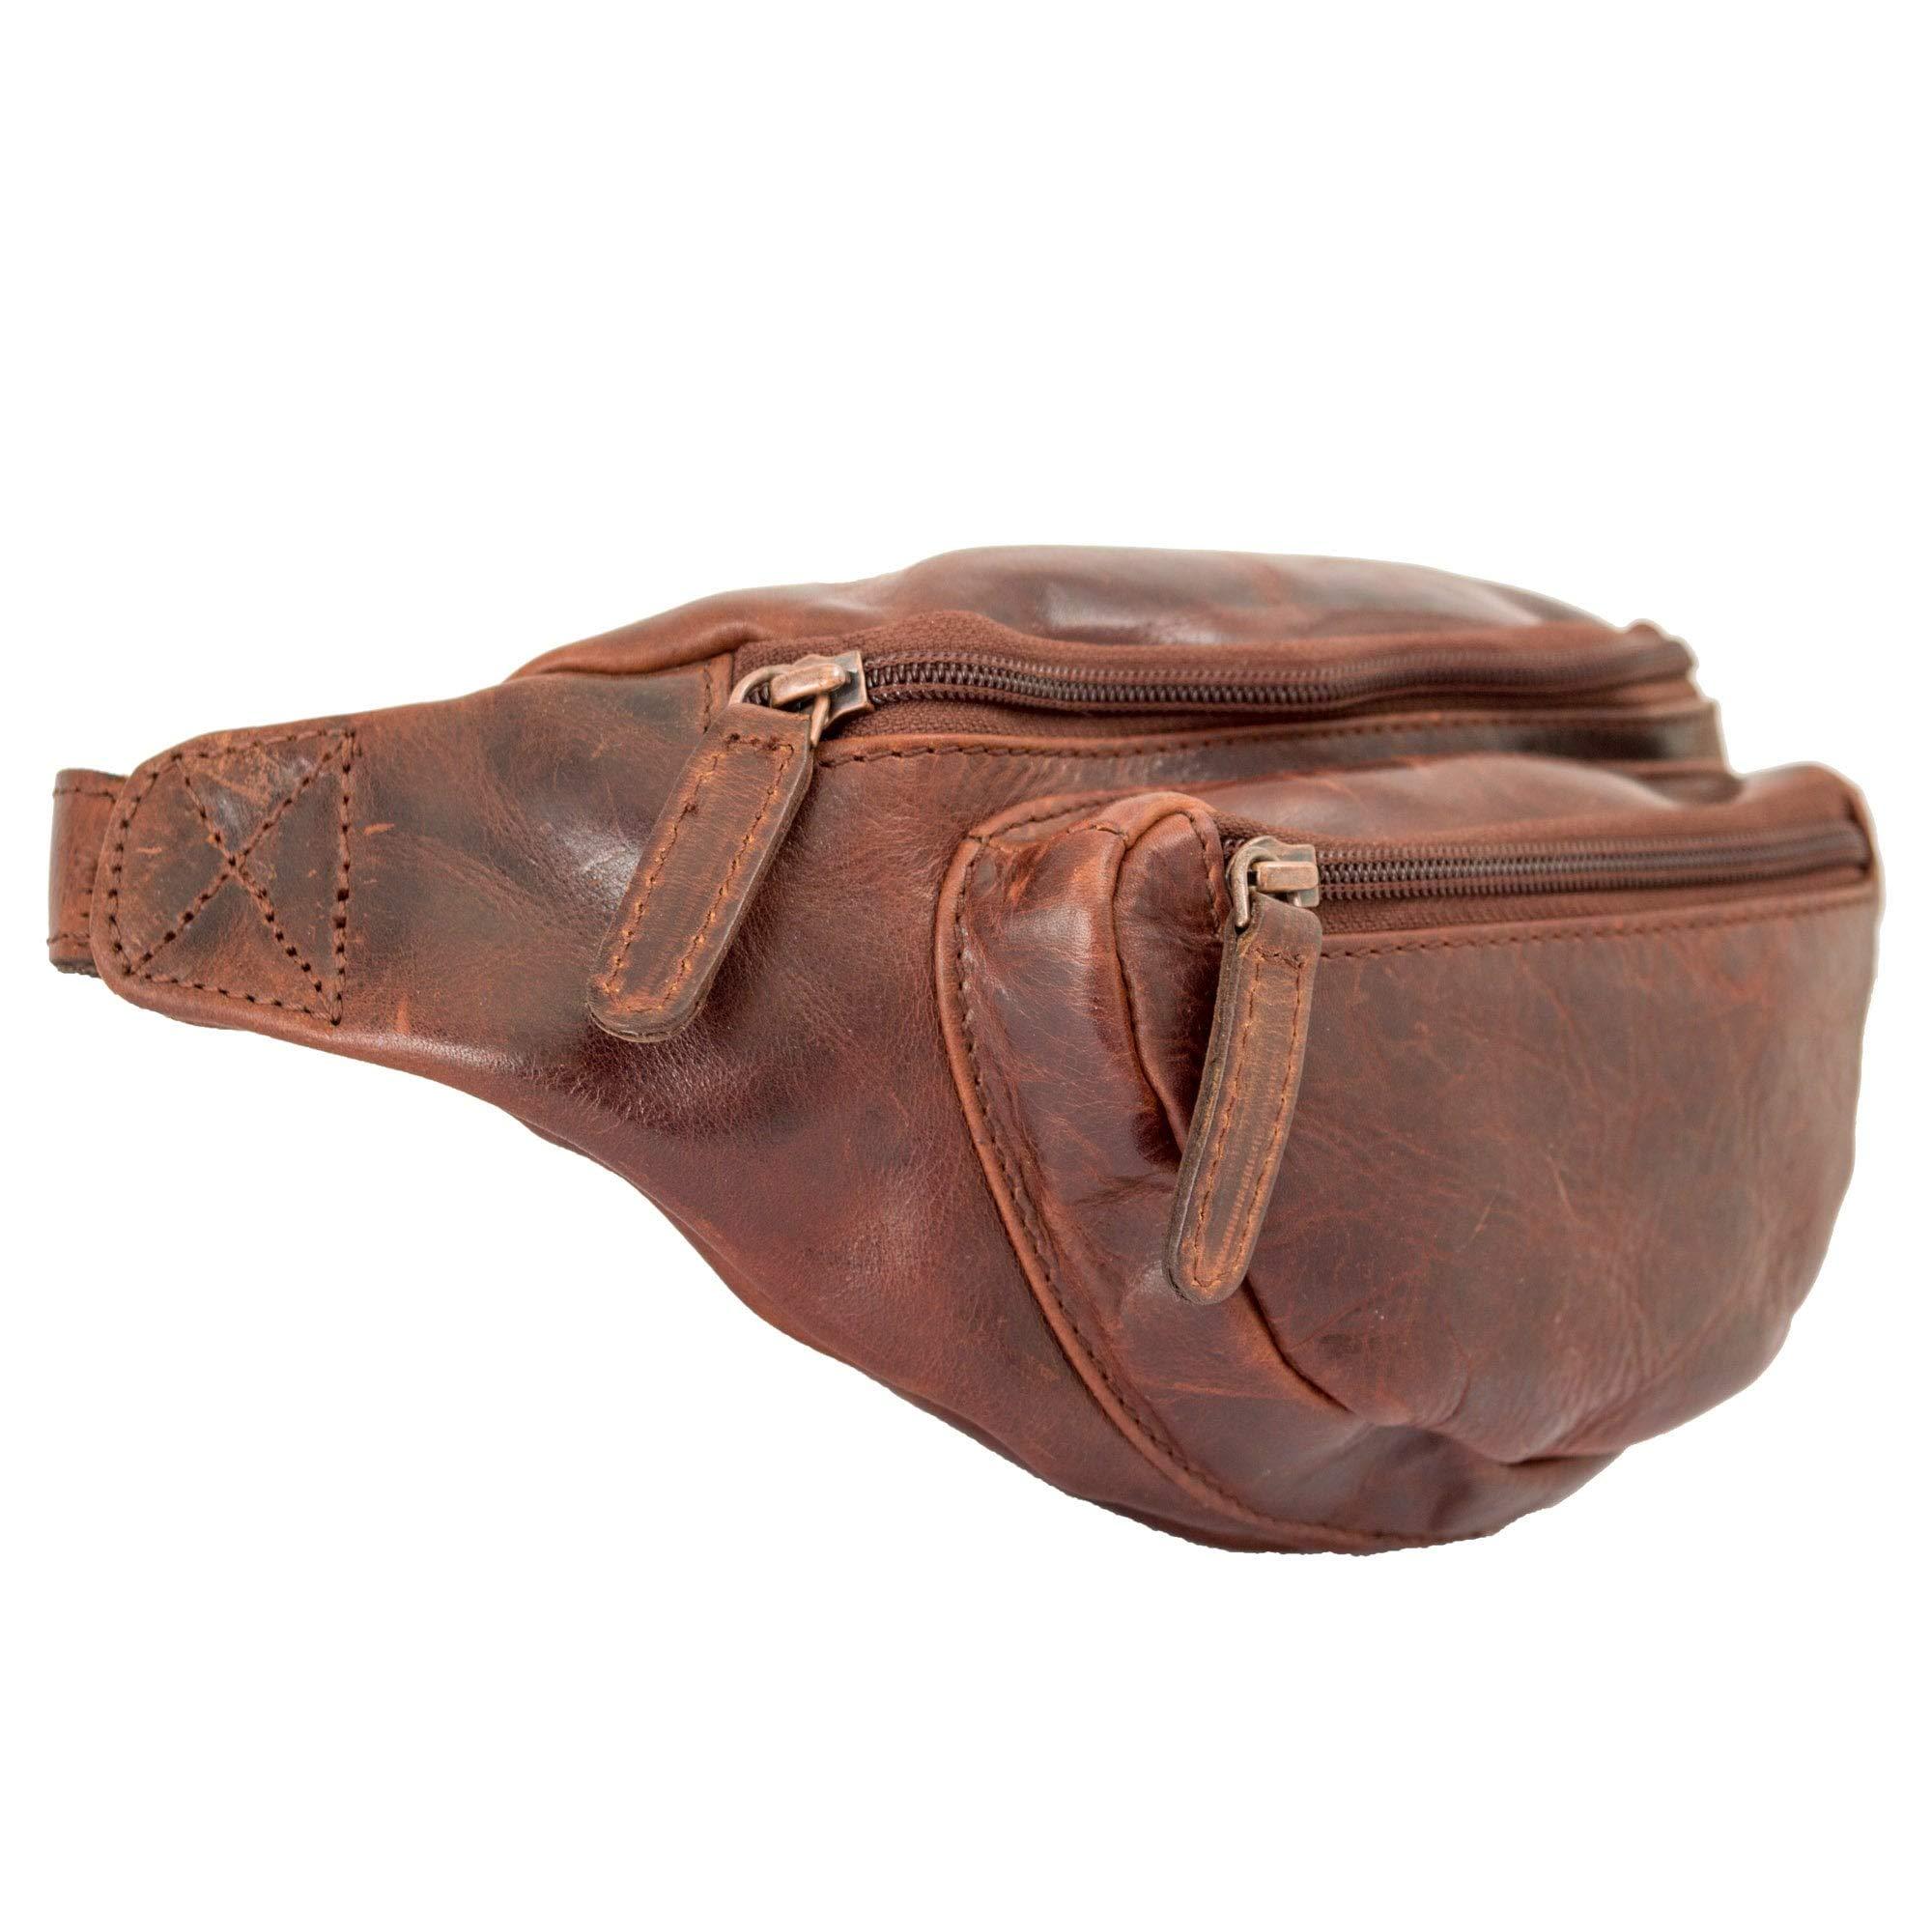 Ashwood Highbury Leather Tan Belt Bag Ed Tan